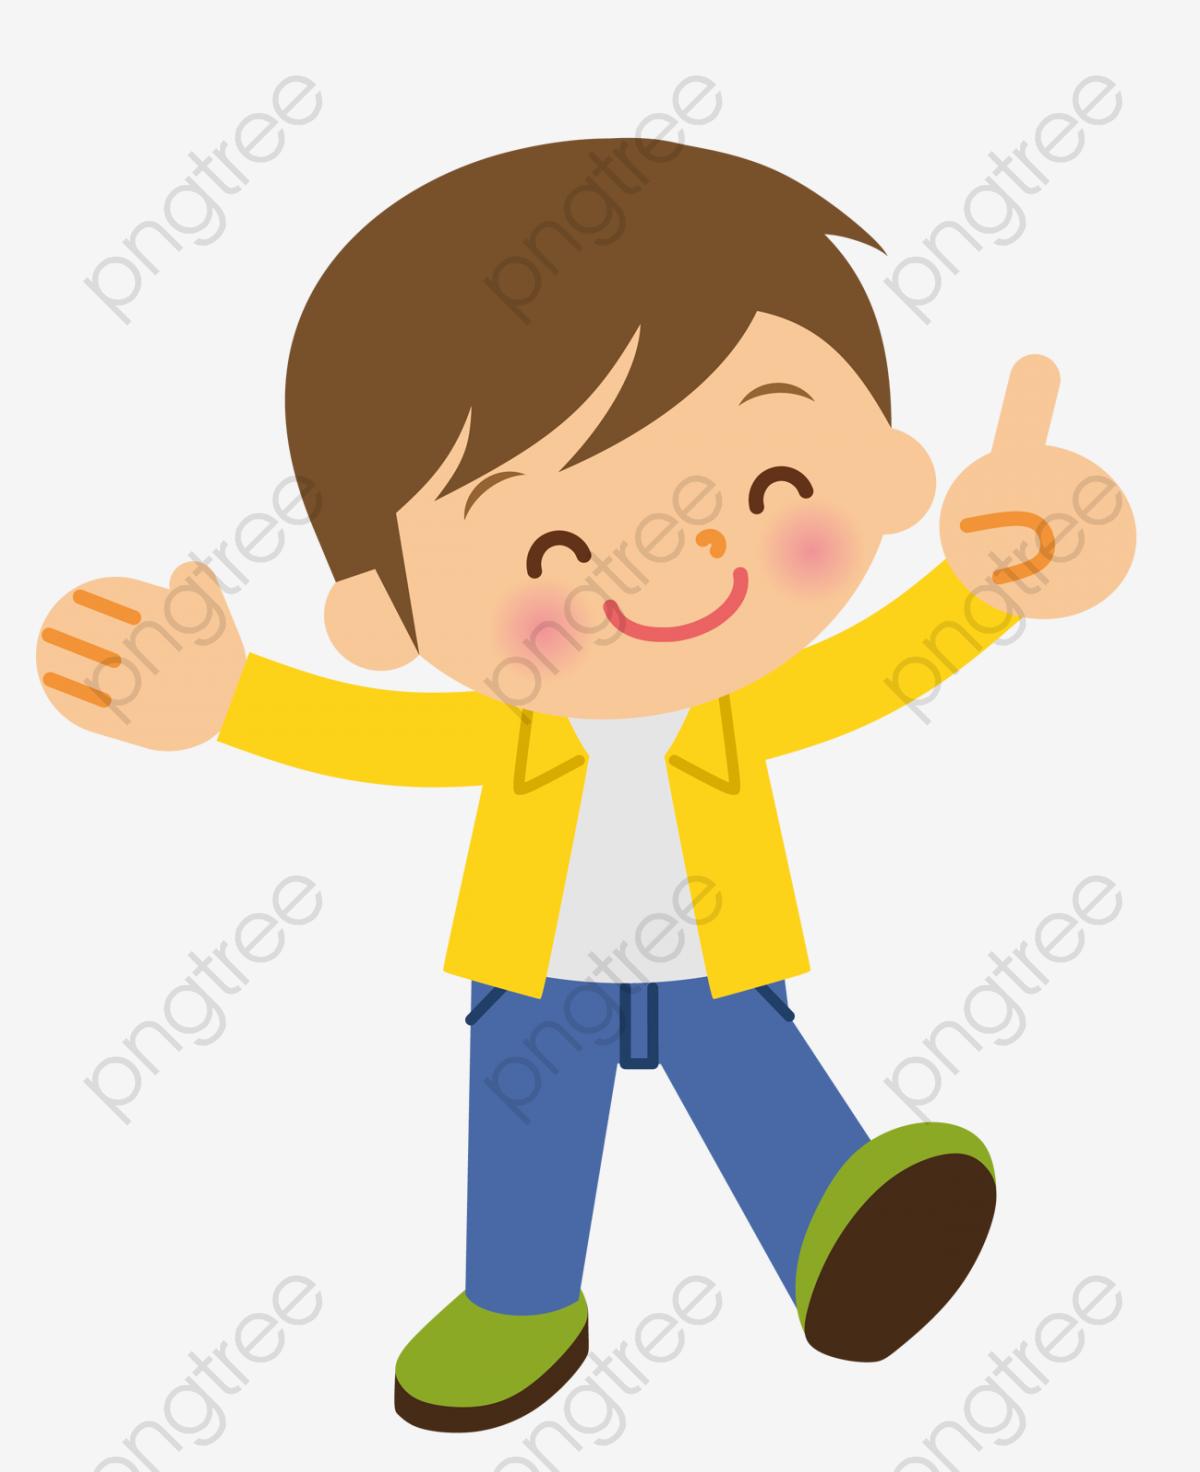 Cartoon Hand Painted Smiling Boy, Cartoon Clipart, Cartoon.